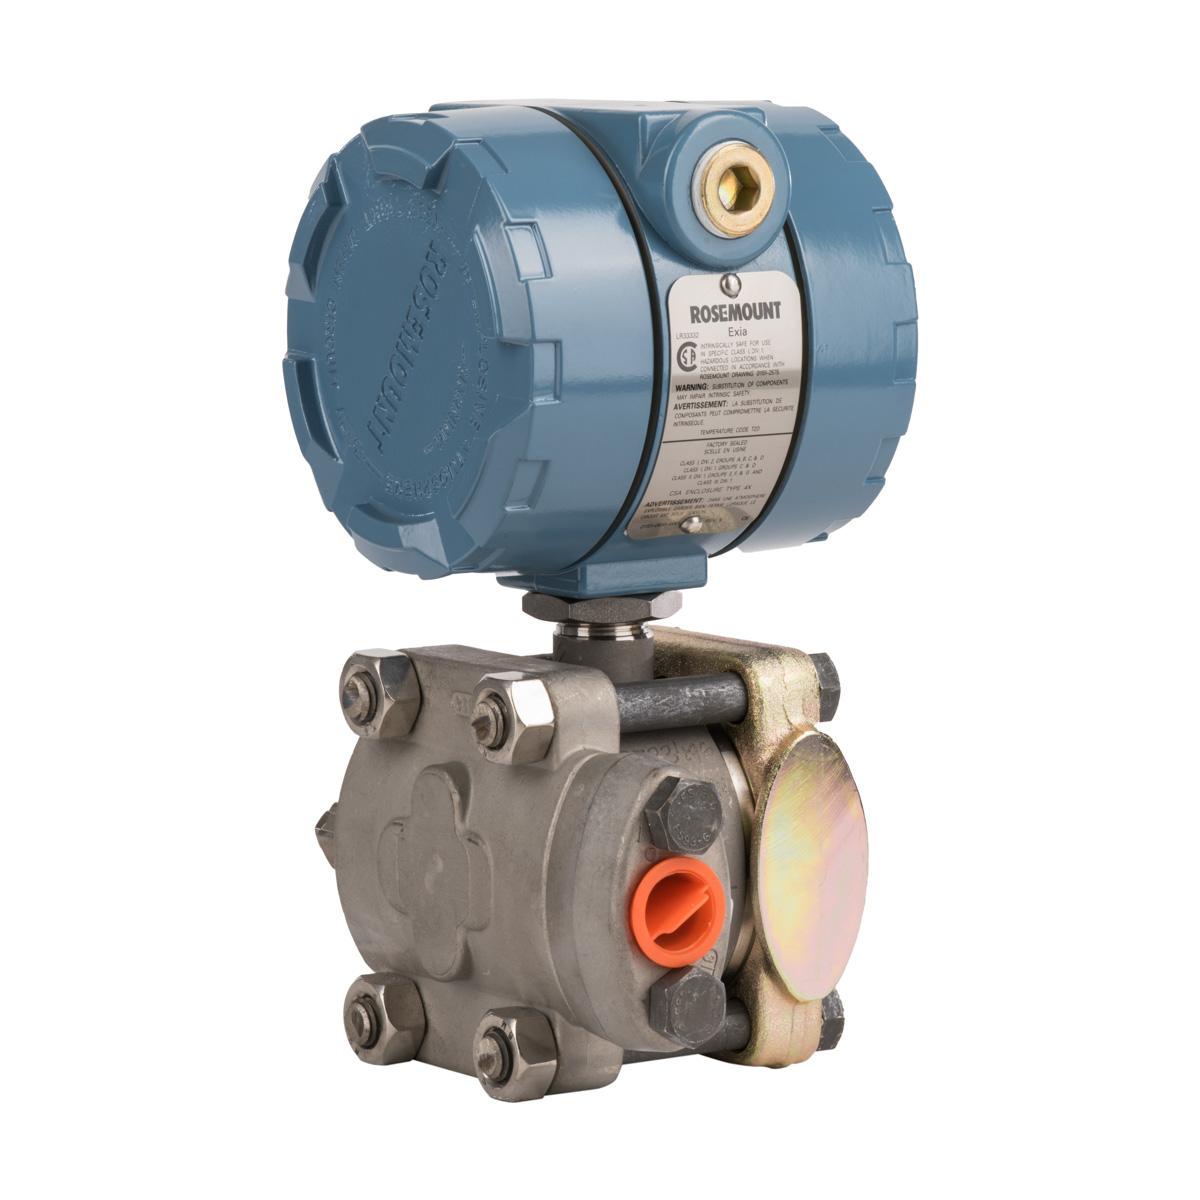 Rosemount 1151 Gauge Pressure Transmitter